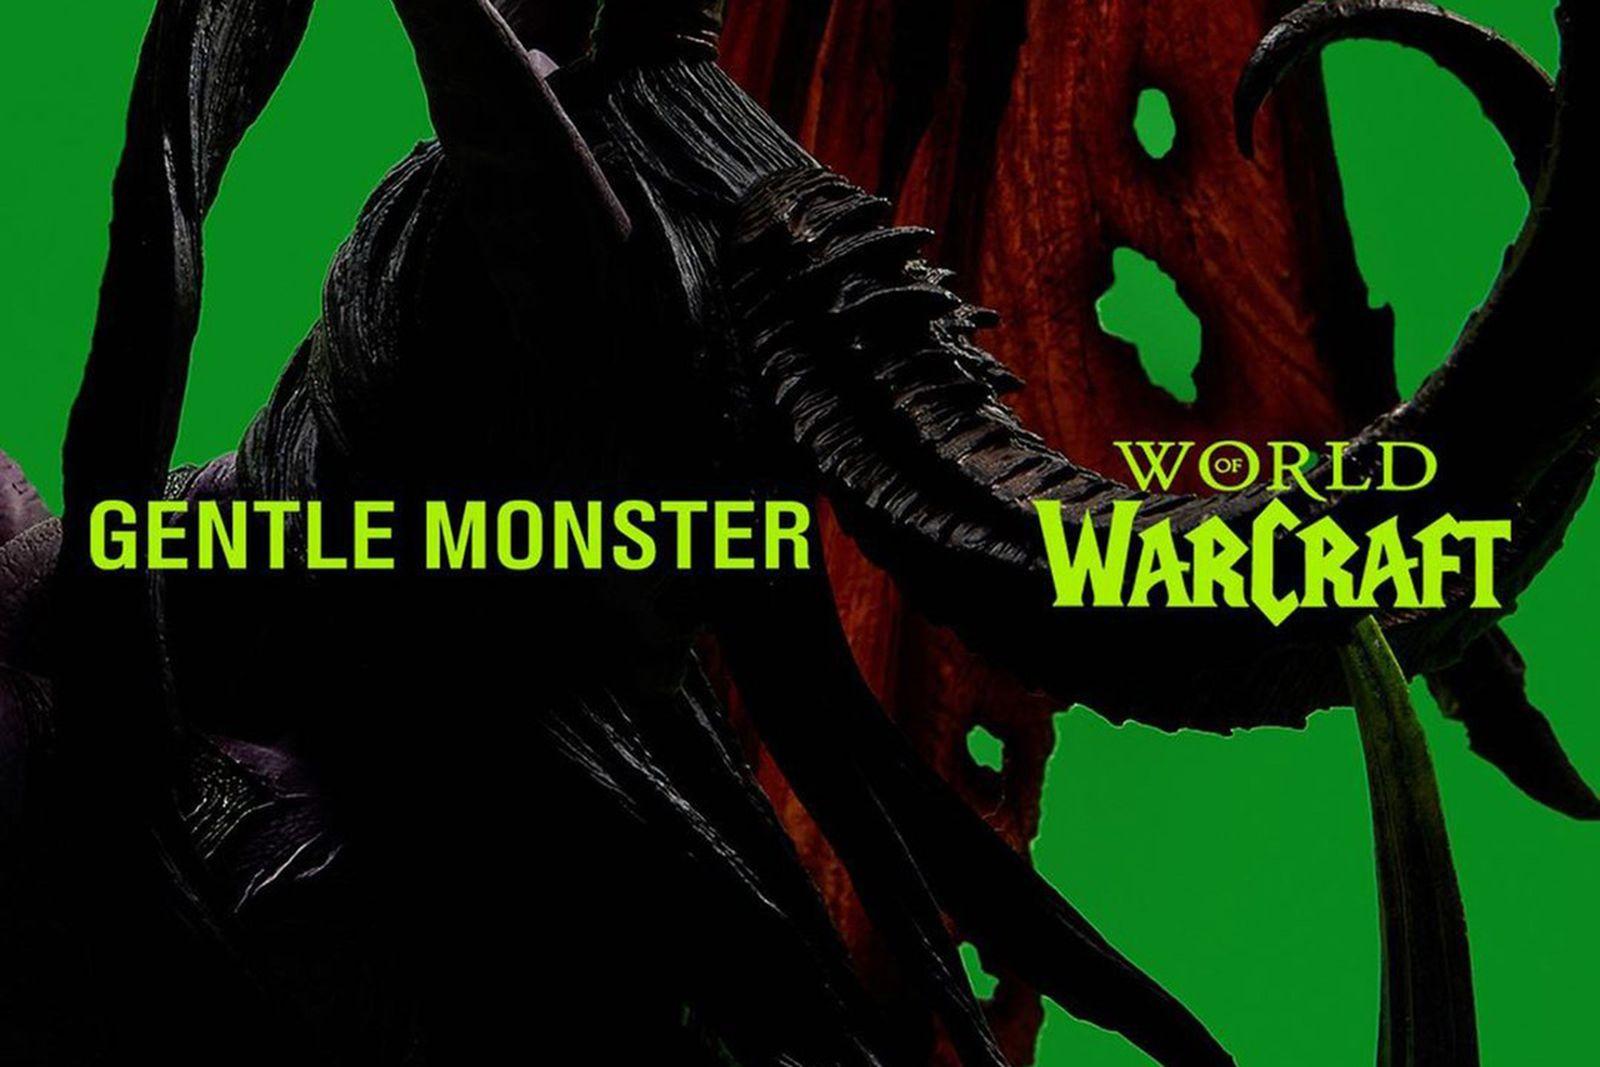 gentle-monster-world-of-warcraft-teaser-main